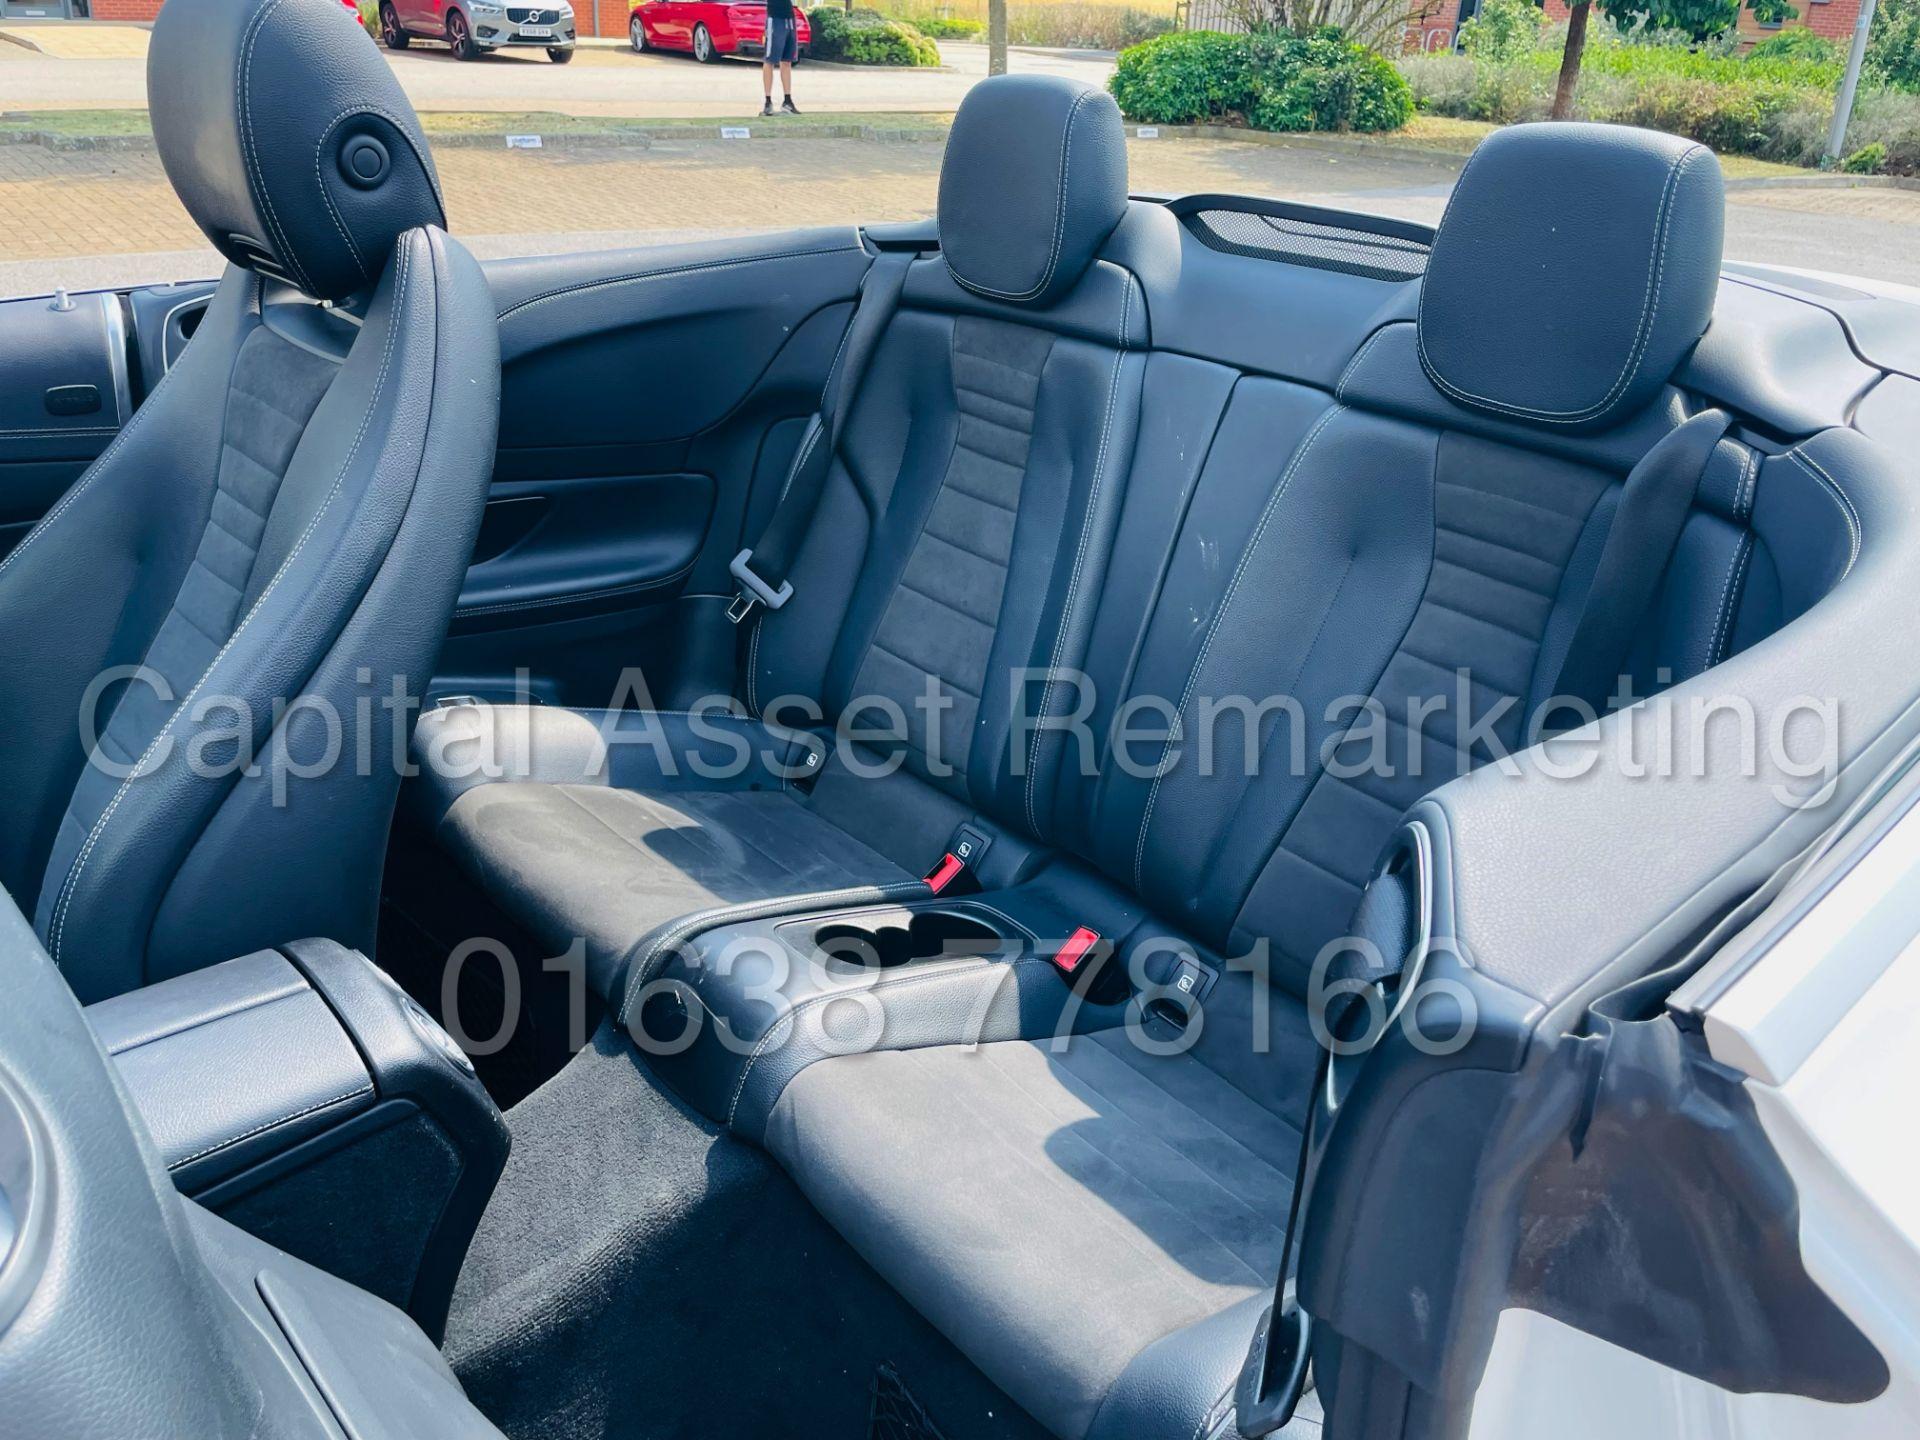 MERCEDES-BENZ E220d *AMG LINE PREMIUM - CABRIOLET* (2018 - EURO 6) '9G AUTO - LEATHER - SAT NAV' - Image 41 of 63